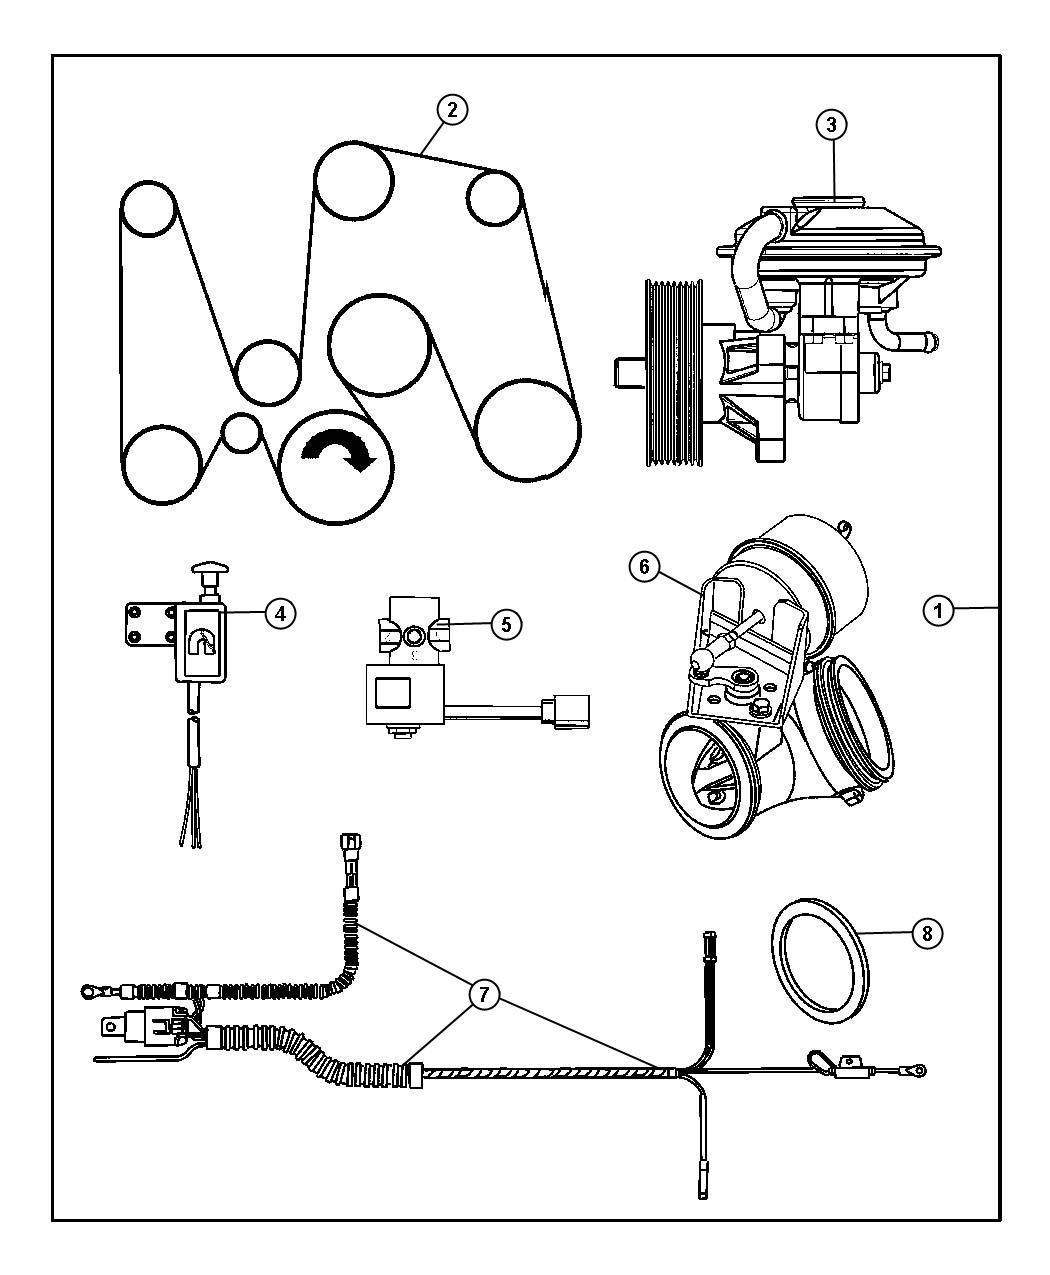 I on Dodge Serpentine Belt Diagram 1999 Ram 1500